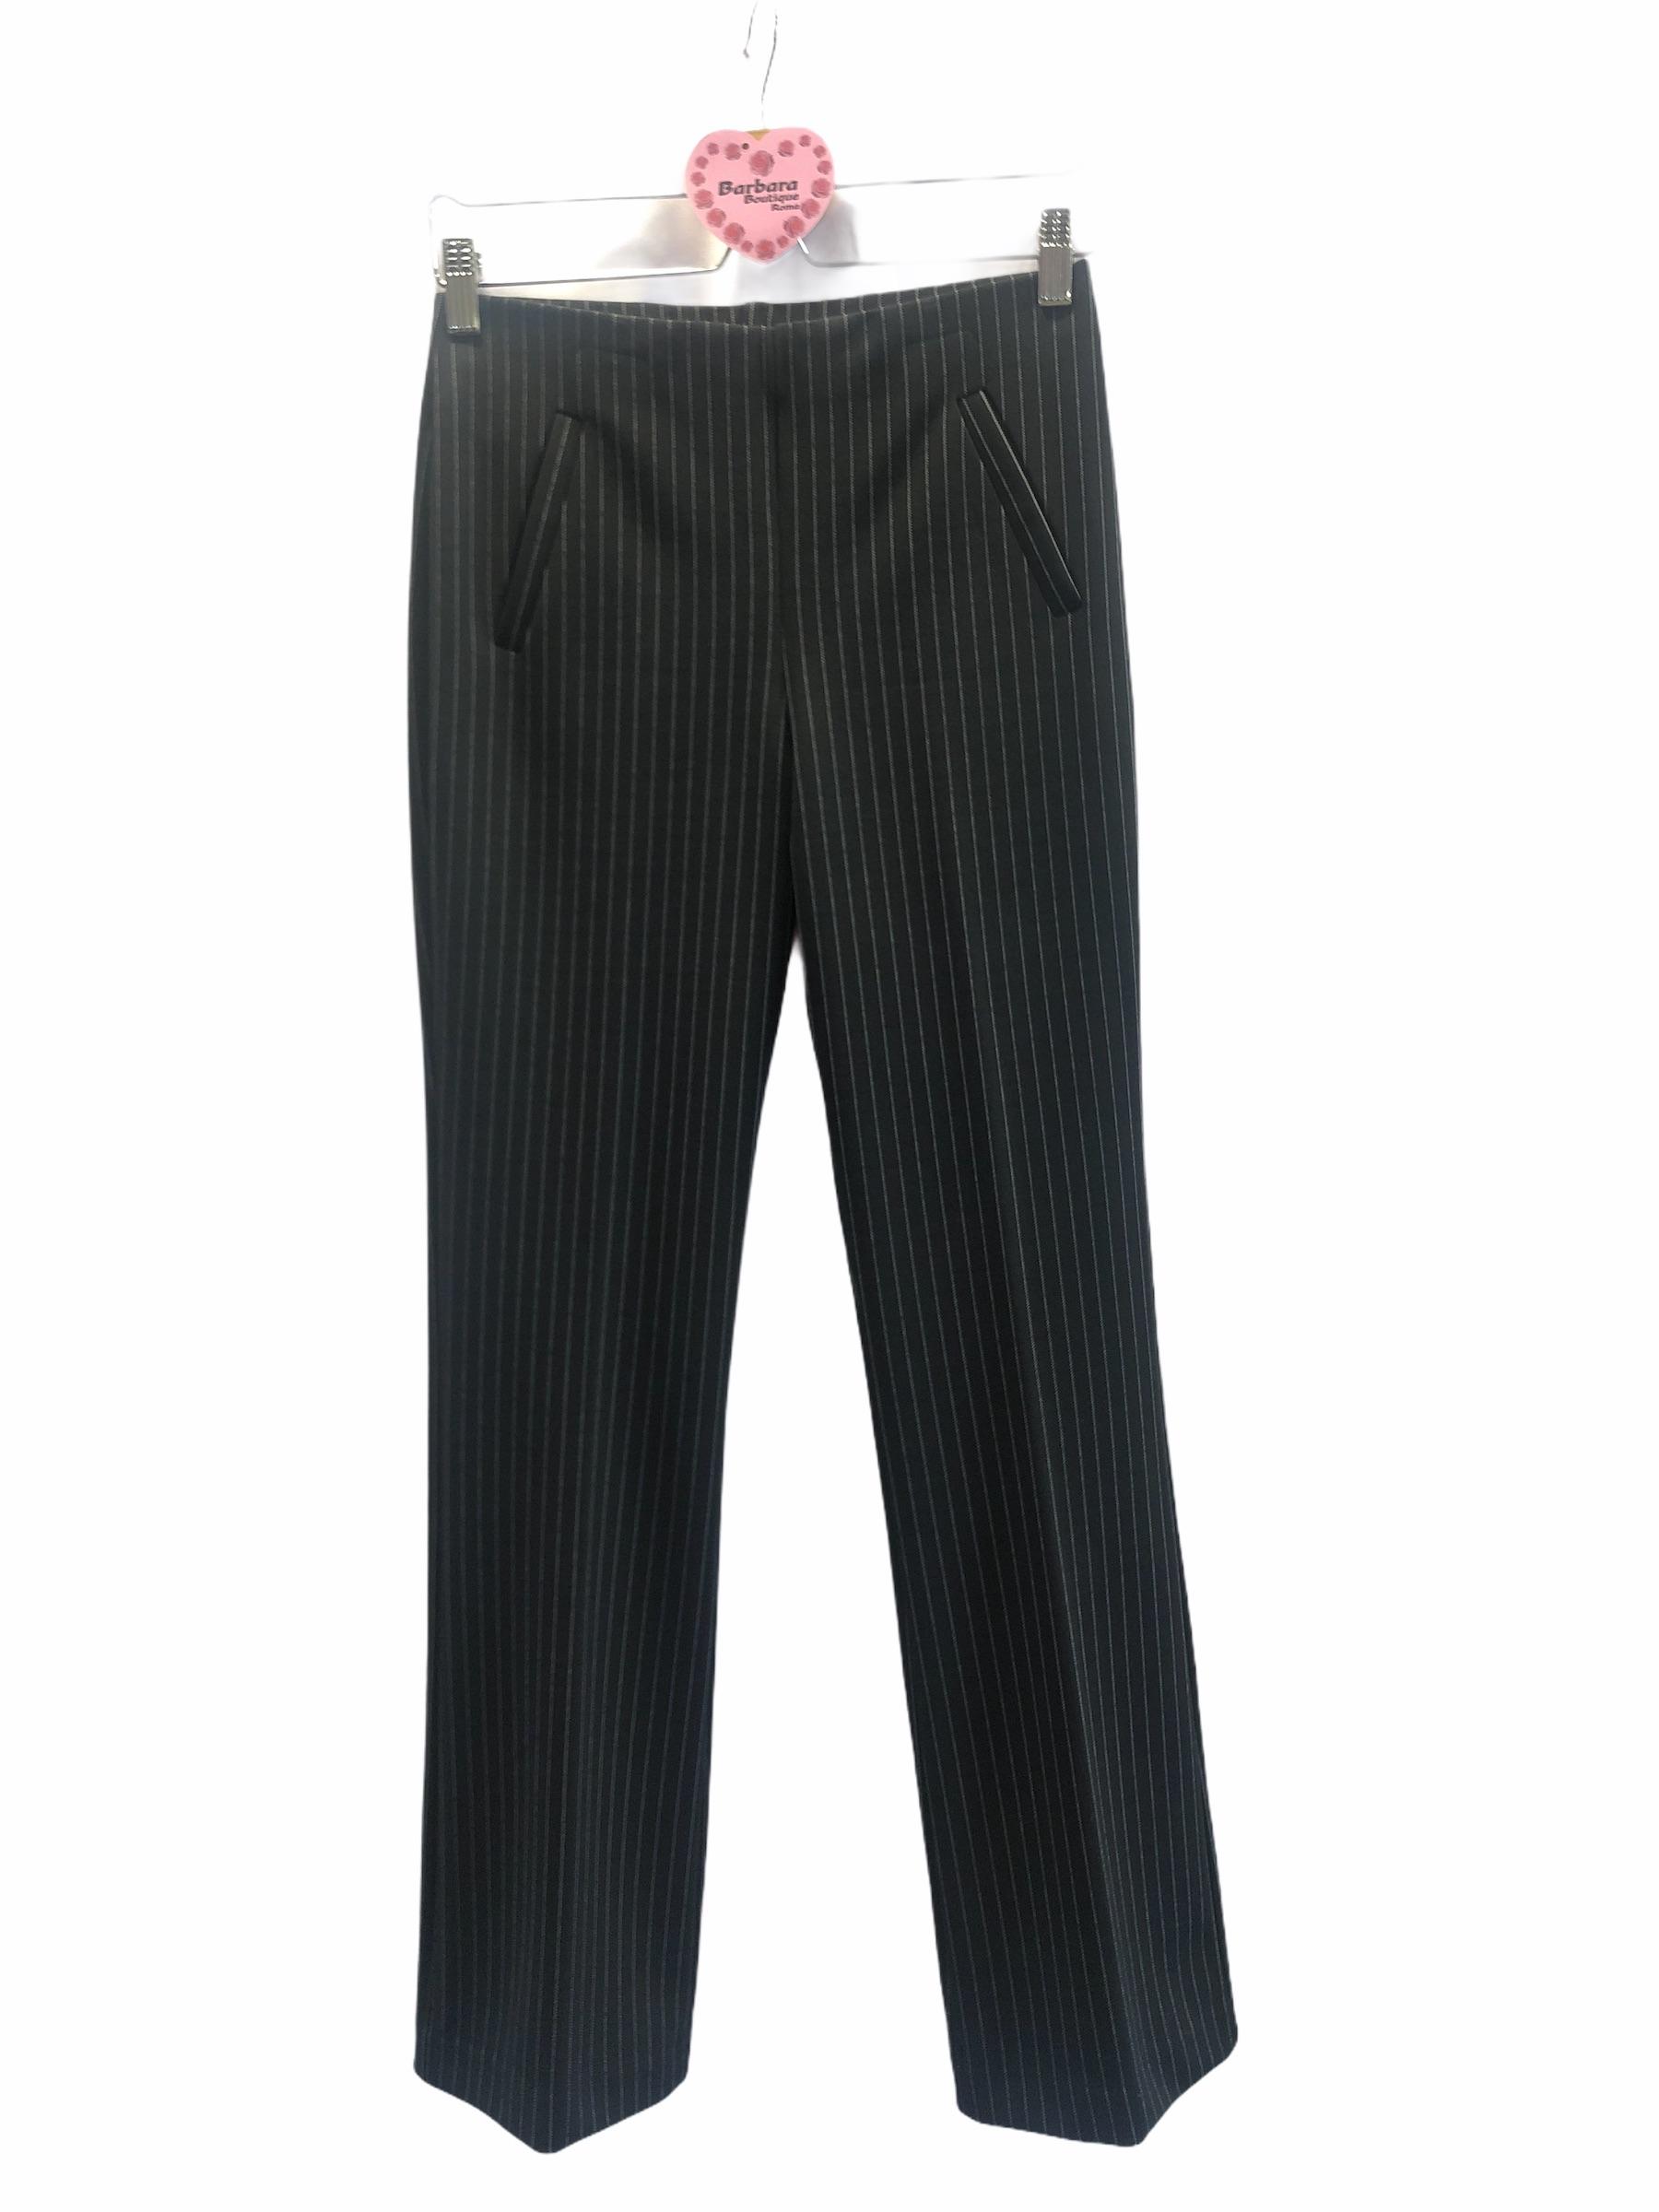 Pantalone gessato flared